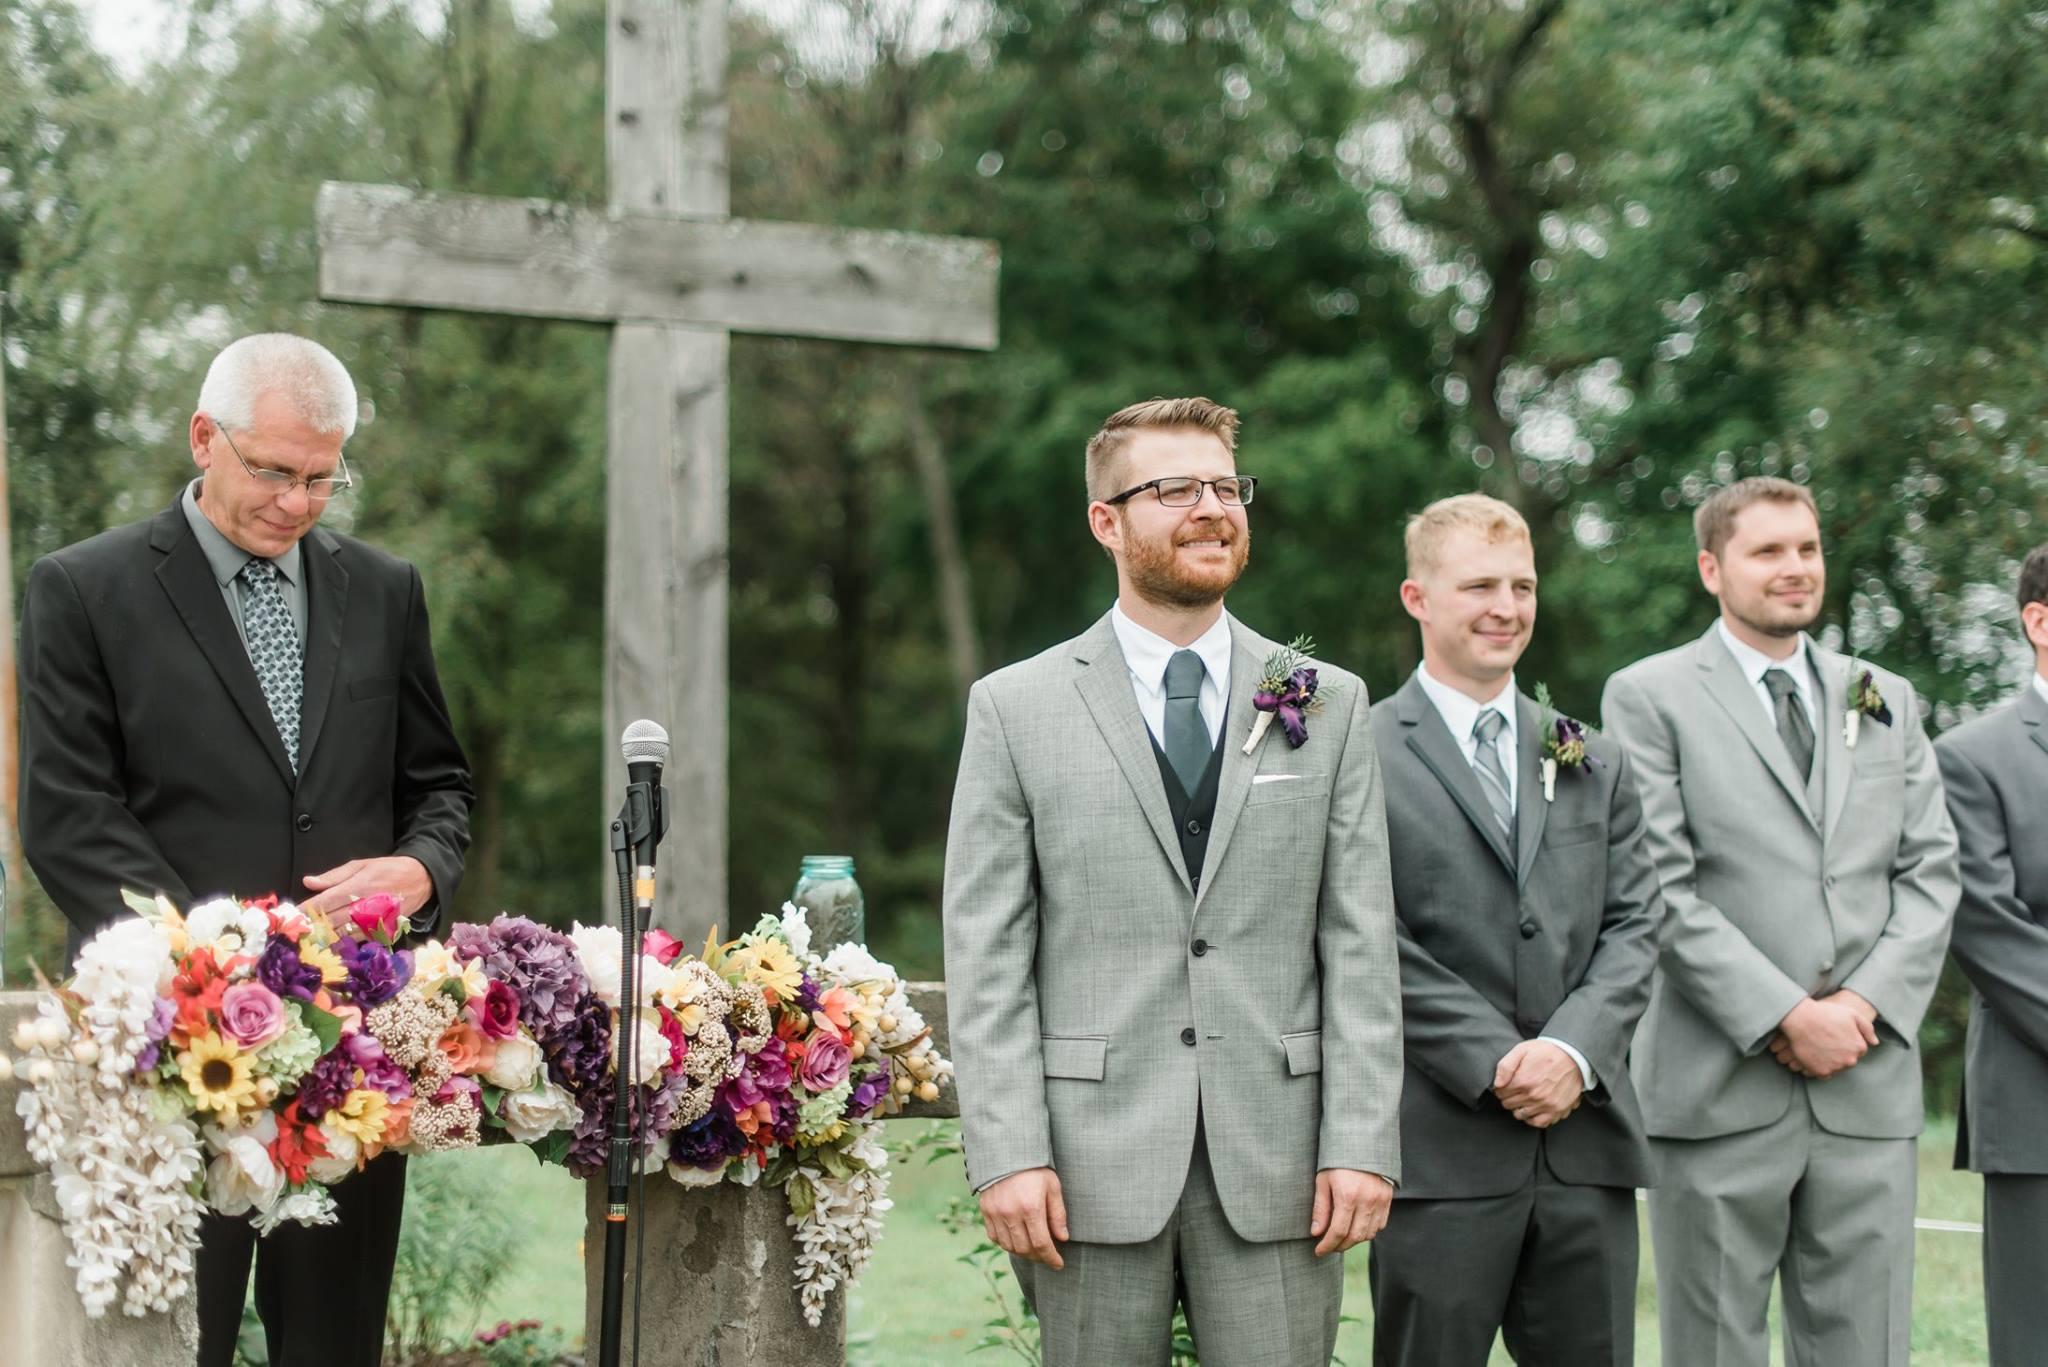 pennsylvania-backyard-wedding-love-diy-bohemian-romantic-colorful-0023.jpg